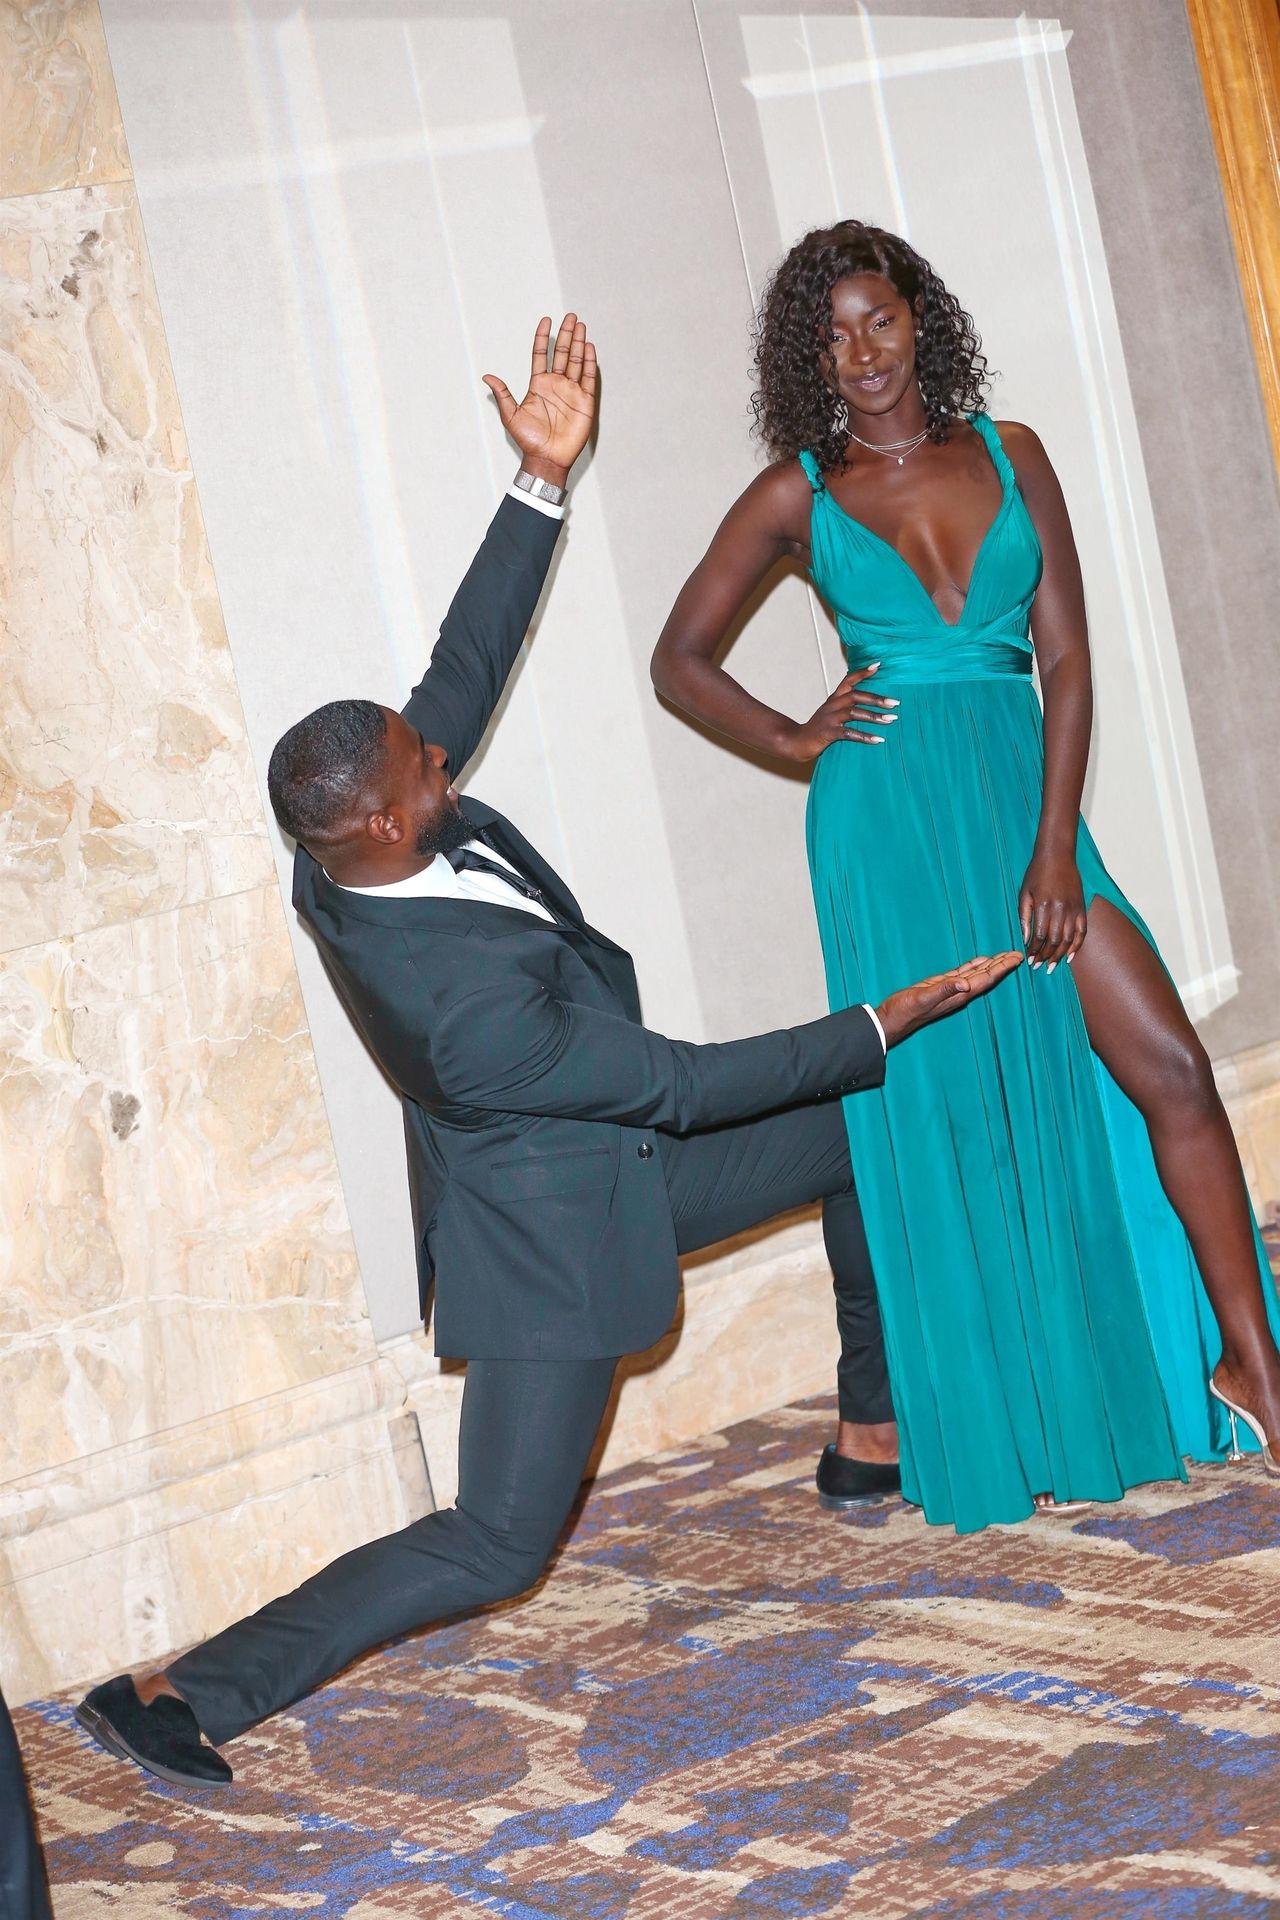 Mike Boateng & Priscilla Anyabu Are Seen At British Ethnic Diversity Sports Awards 0141